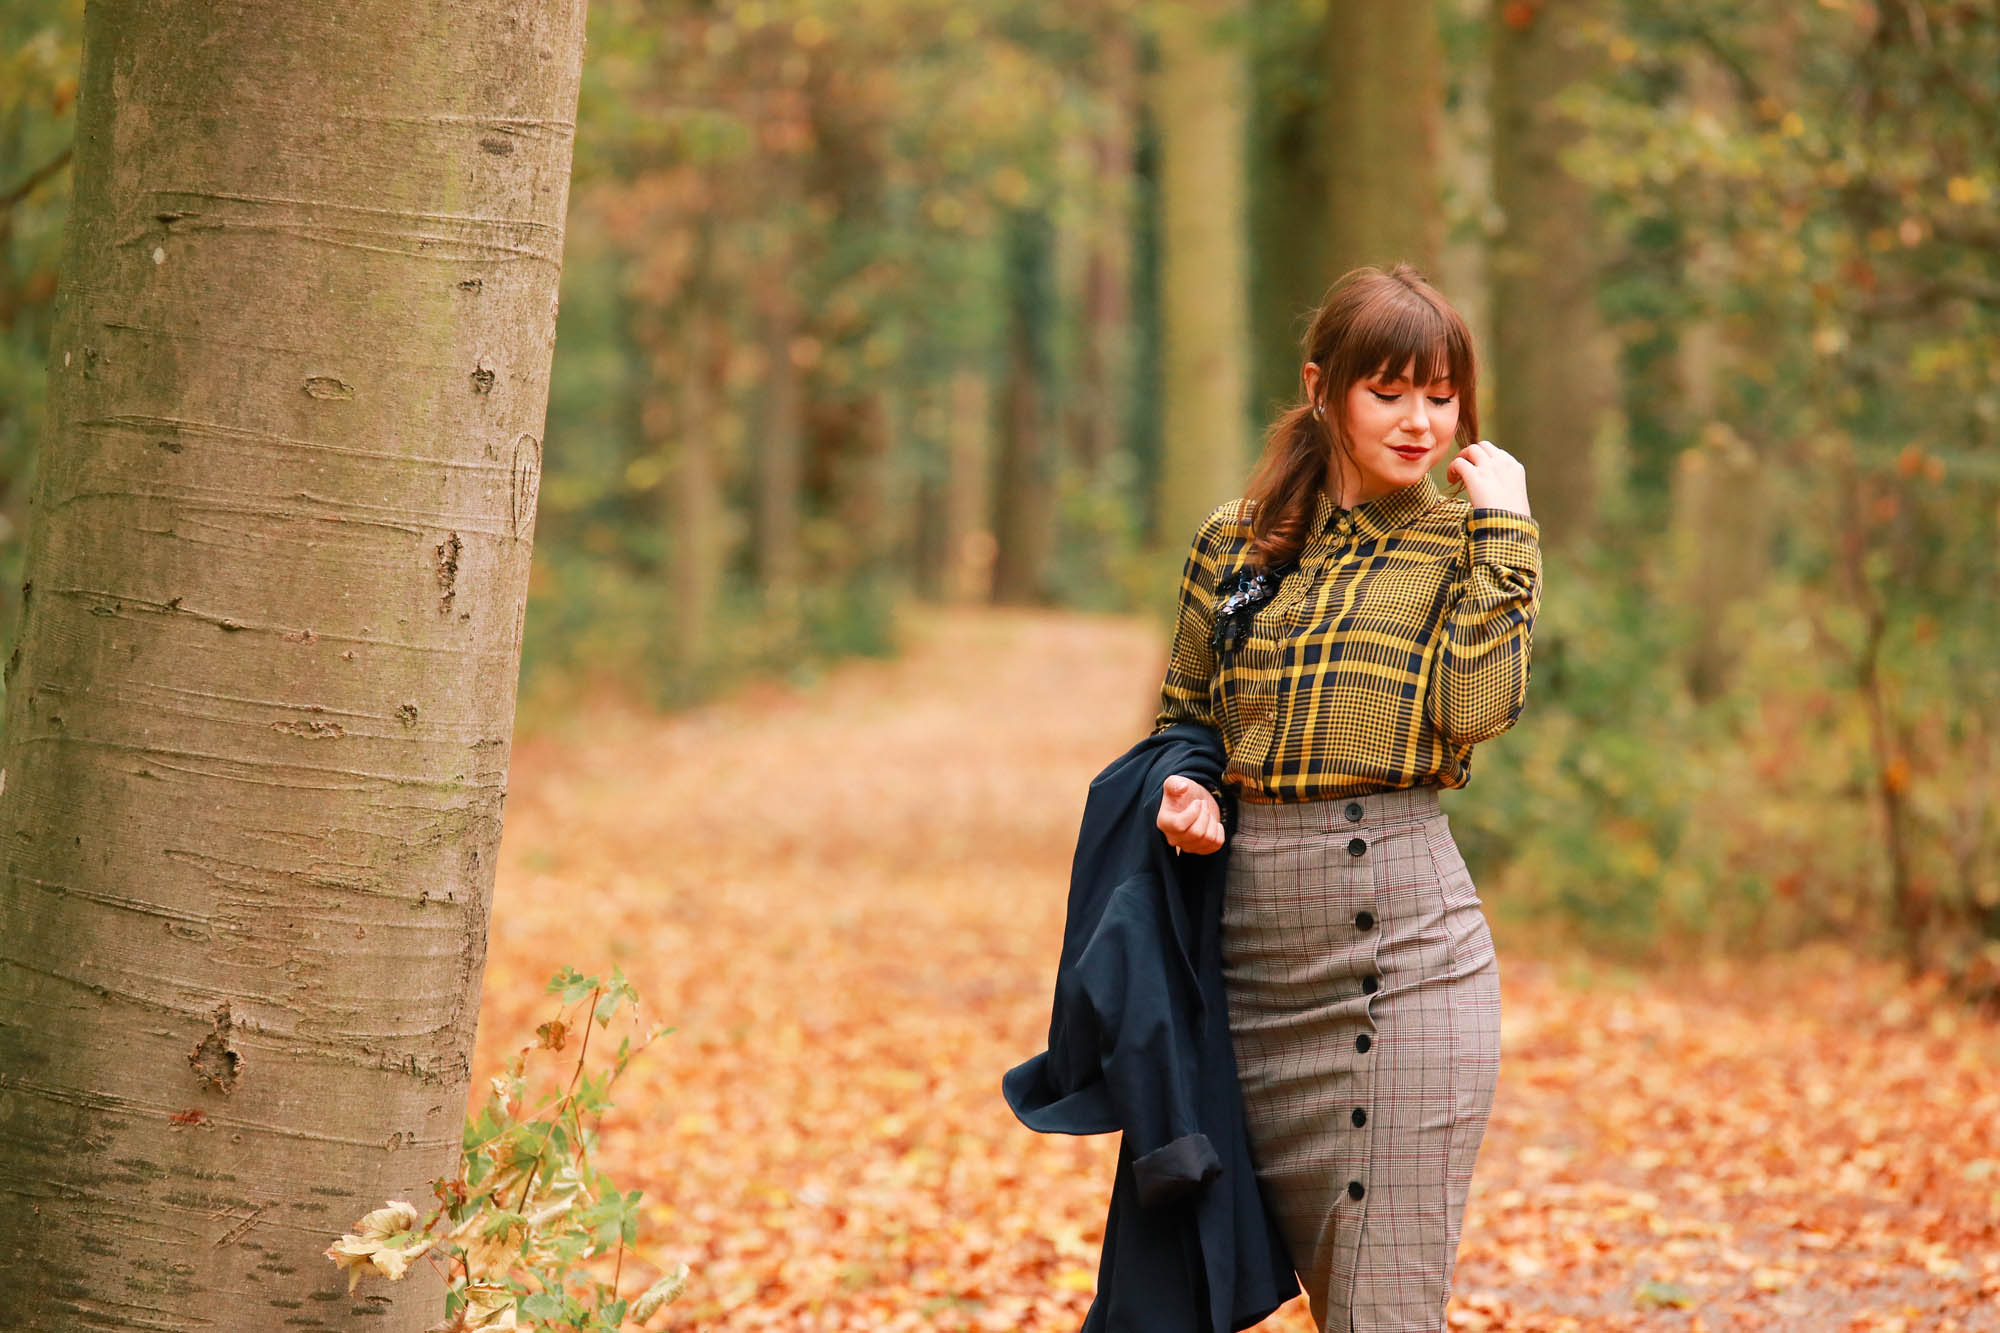 Karomuster Tartan Modeblog Deutschland